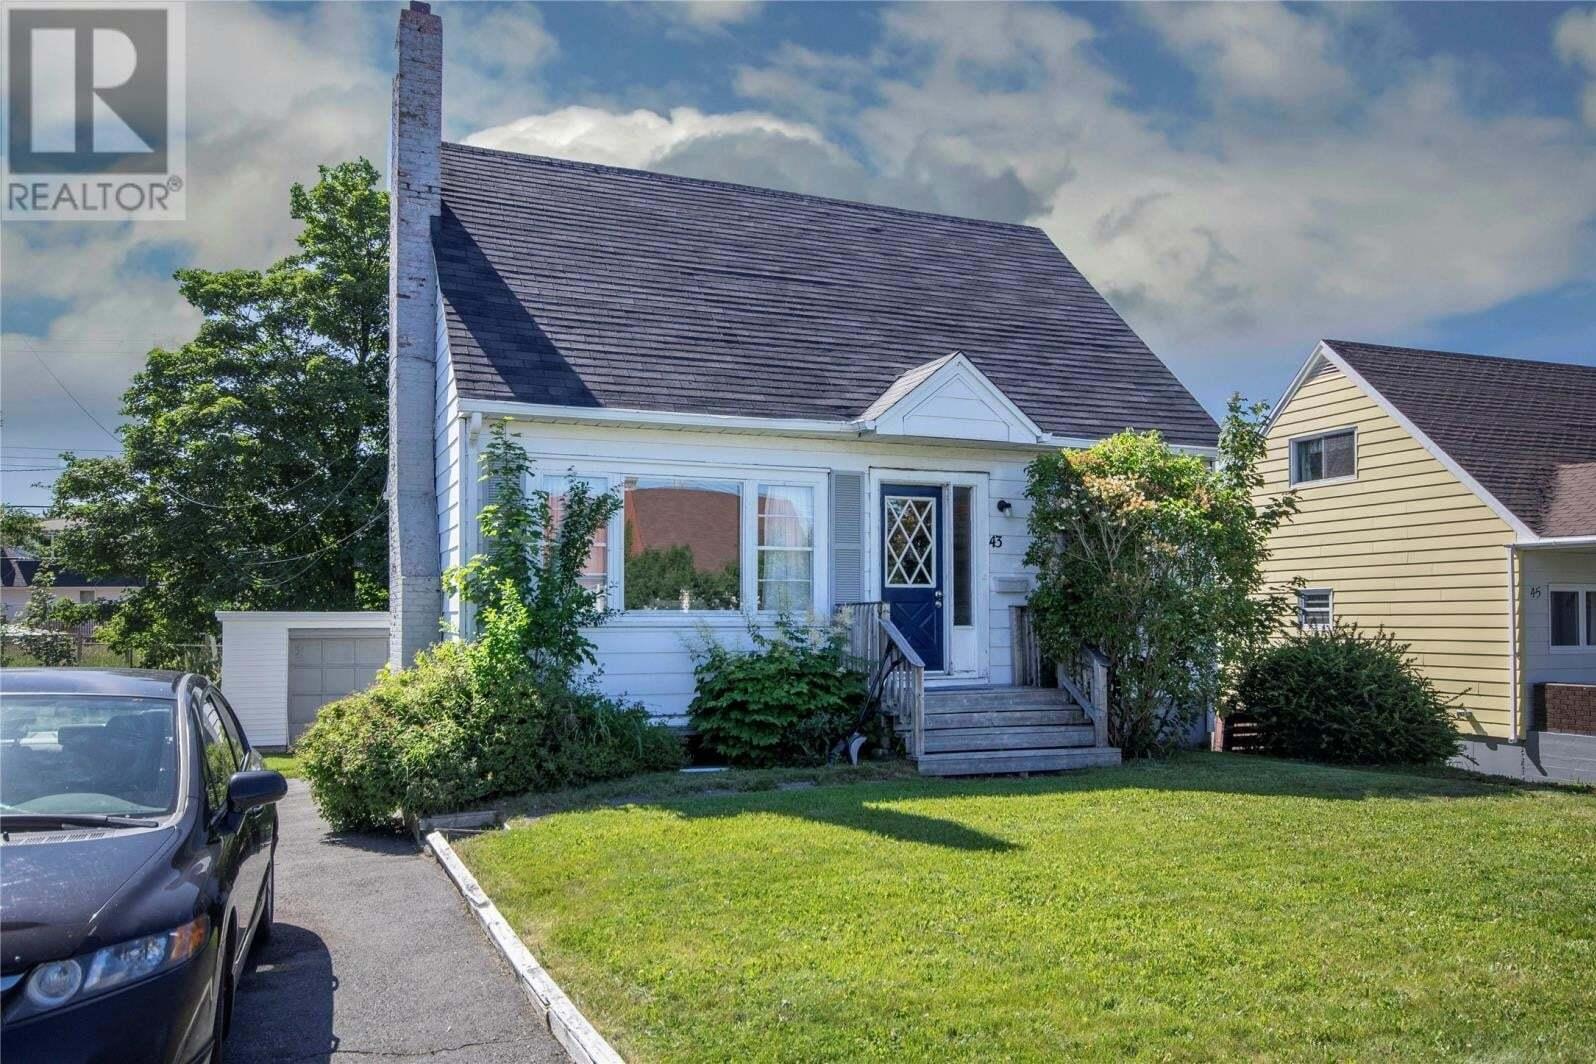 House for sale at 43 Graves St St. John's Newfoundland - MLS: 1217210